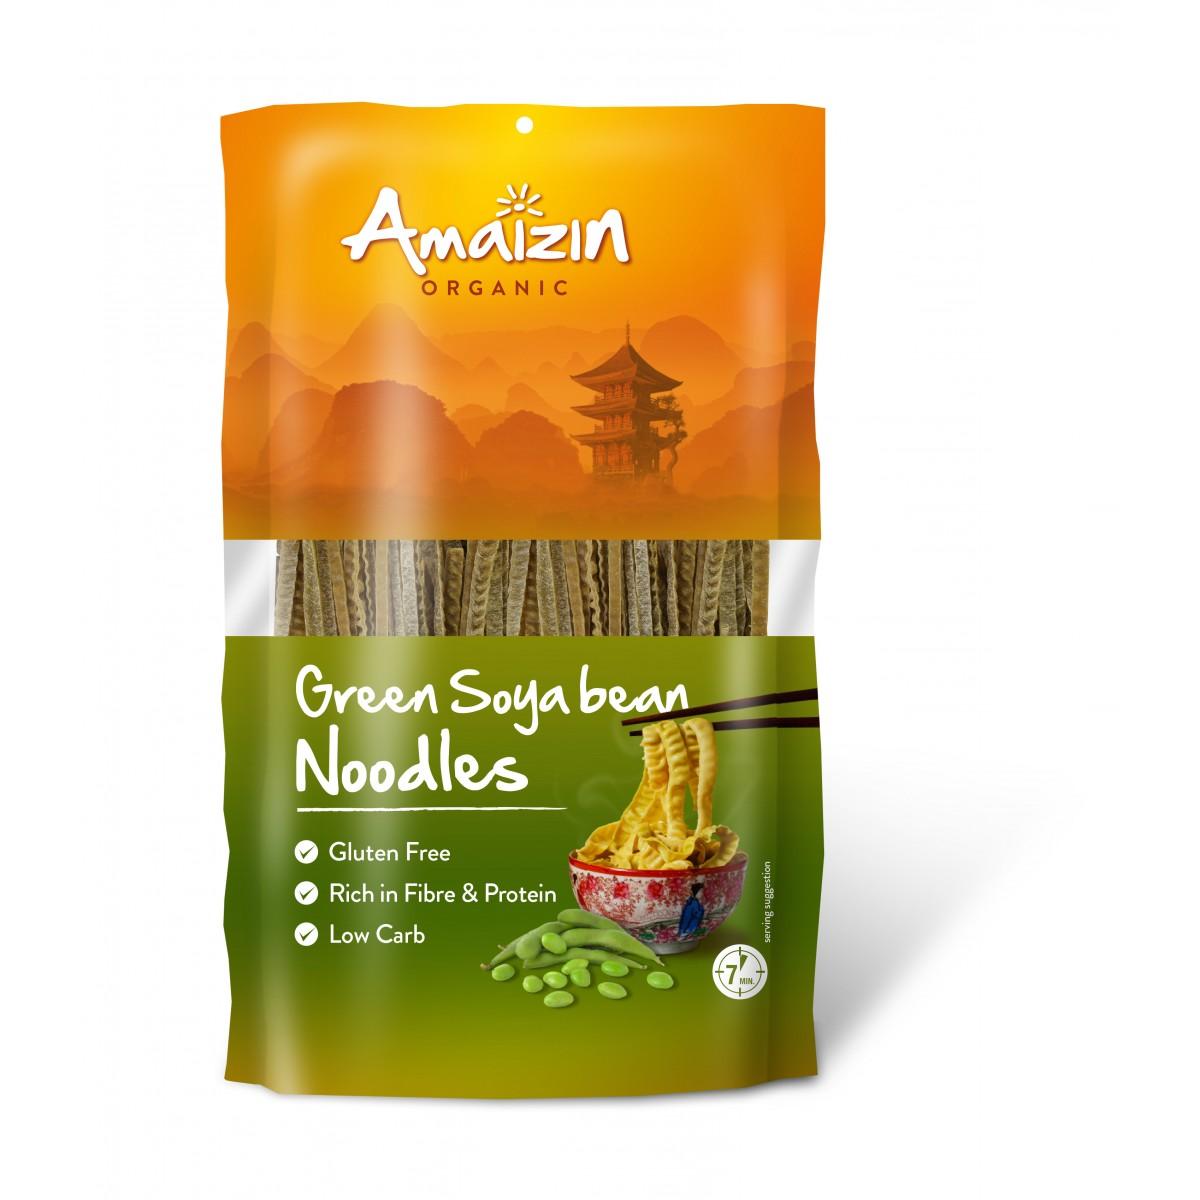 Groene Sojabonen Noodles